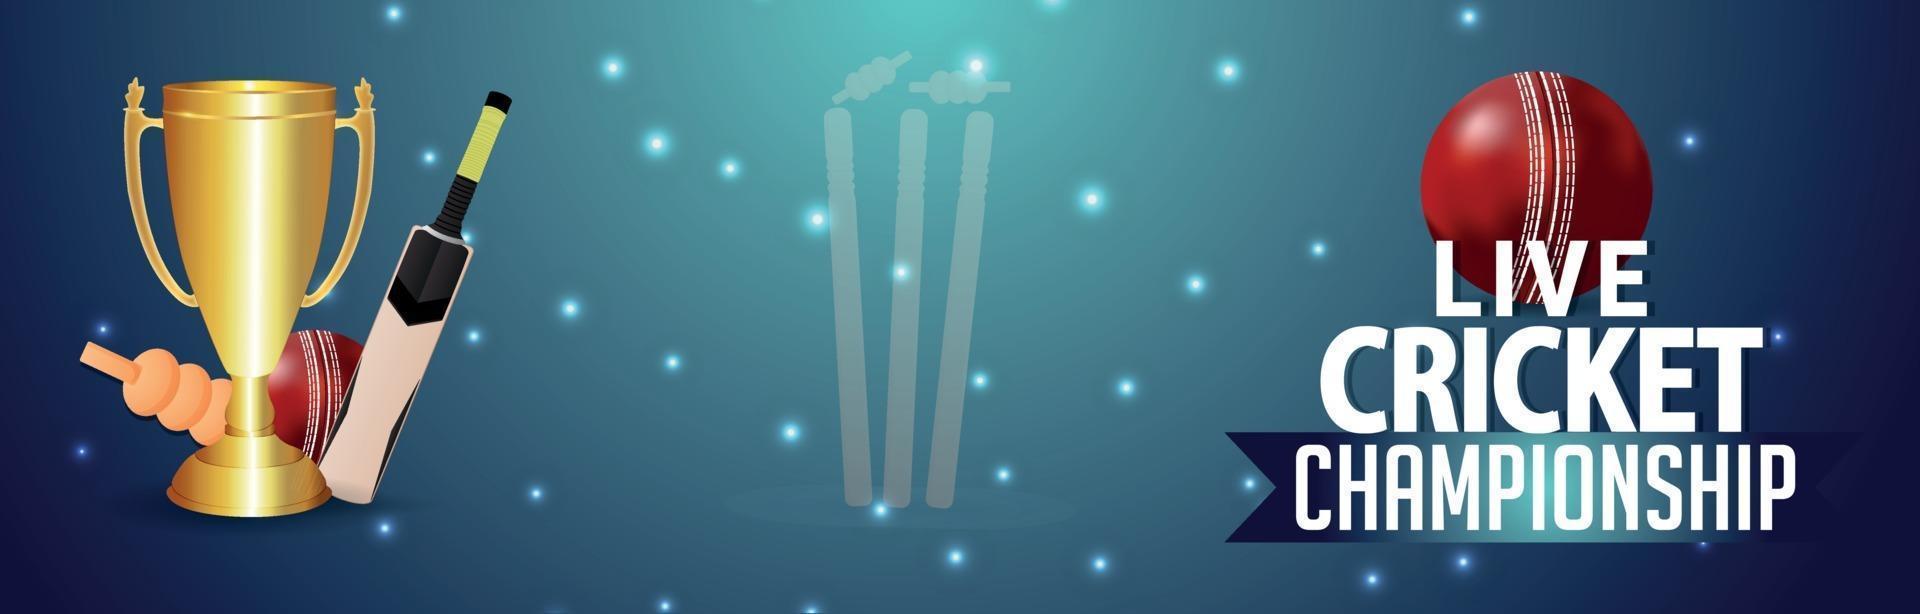 cricket toernooi stadion achtergrond met cricket apparatuur vector